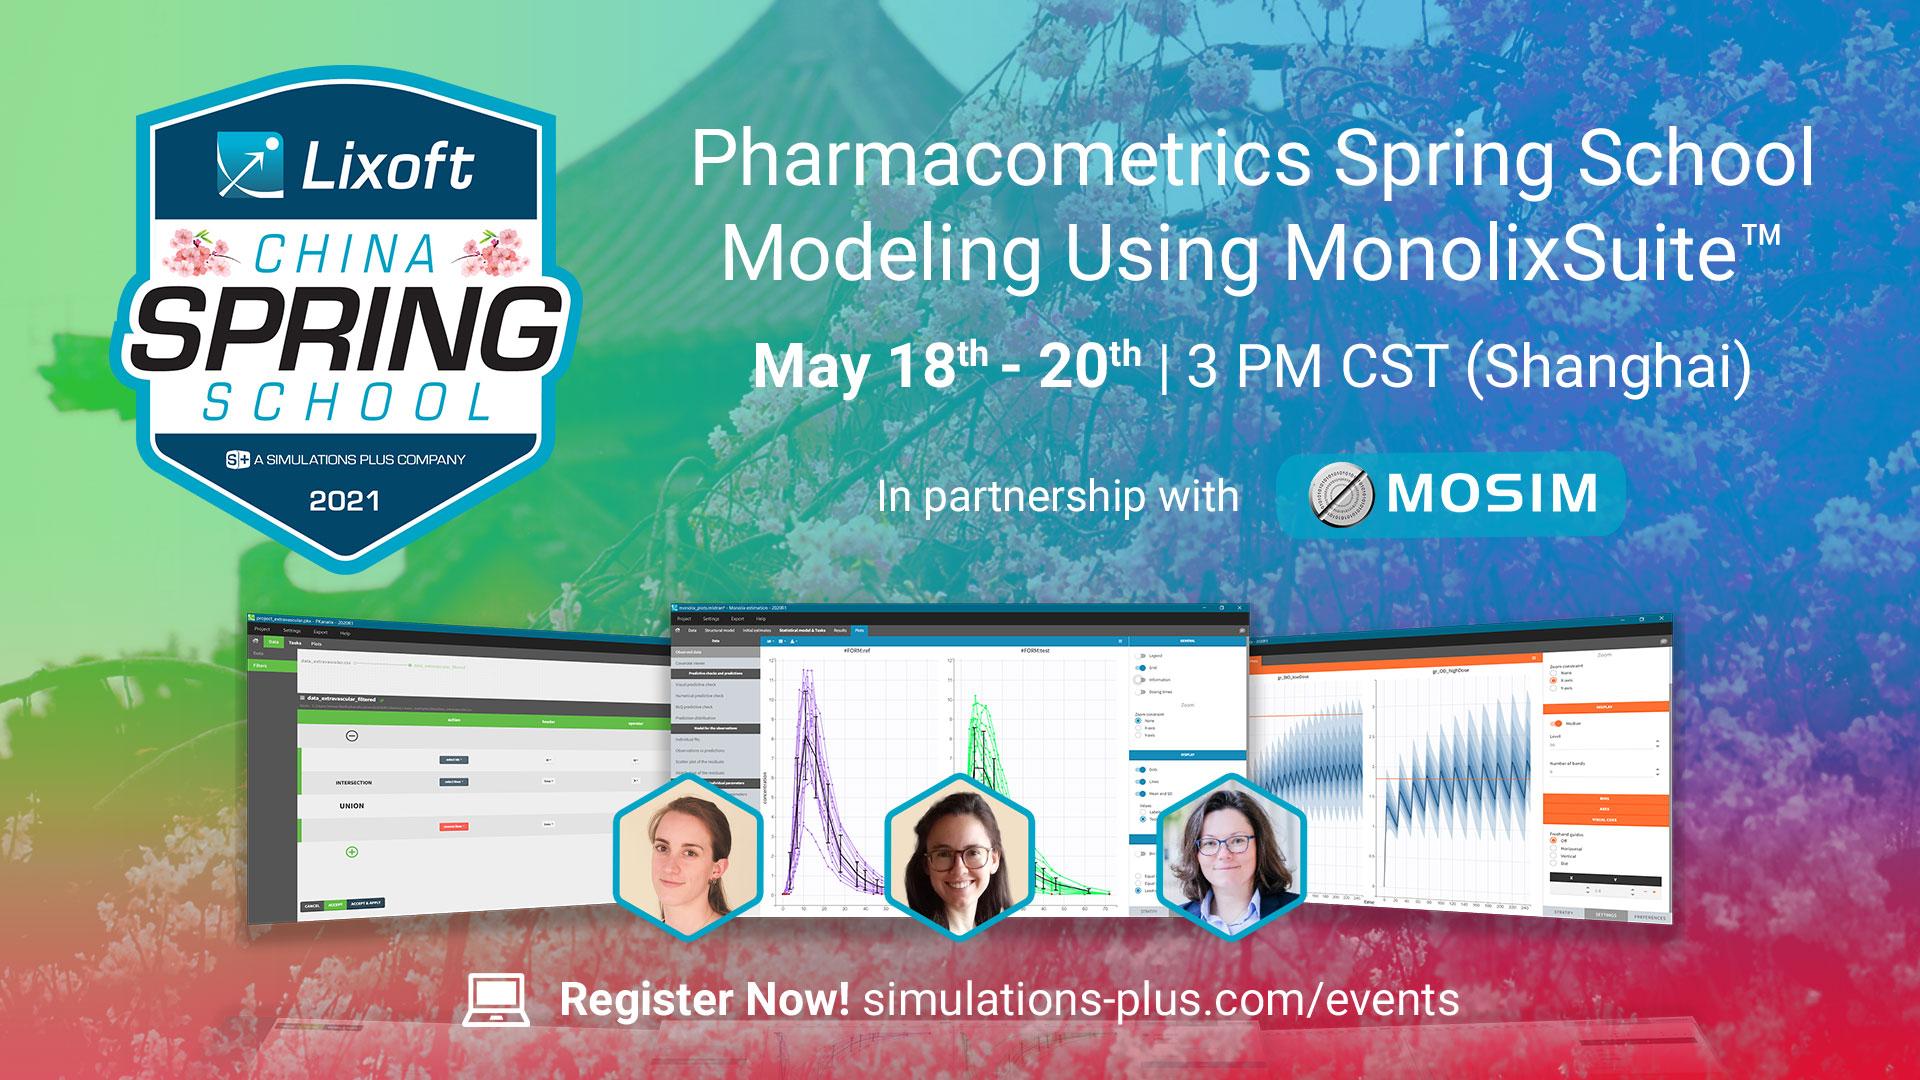 pharmacometrics spring school modeling using monolixsuite